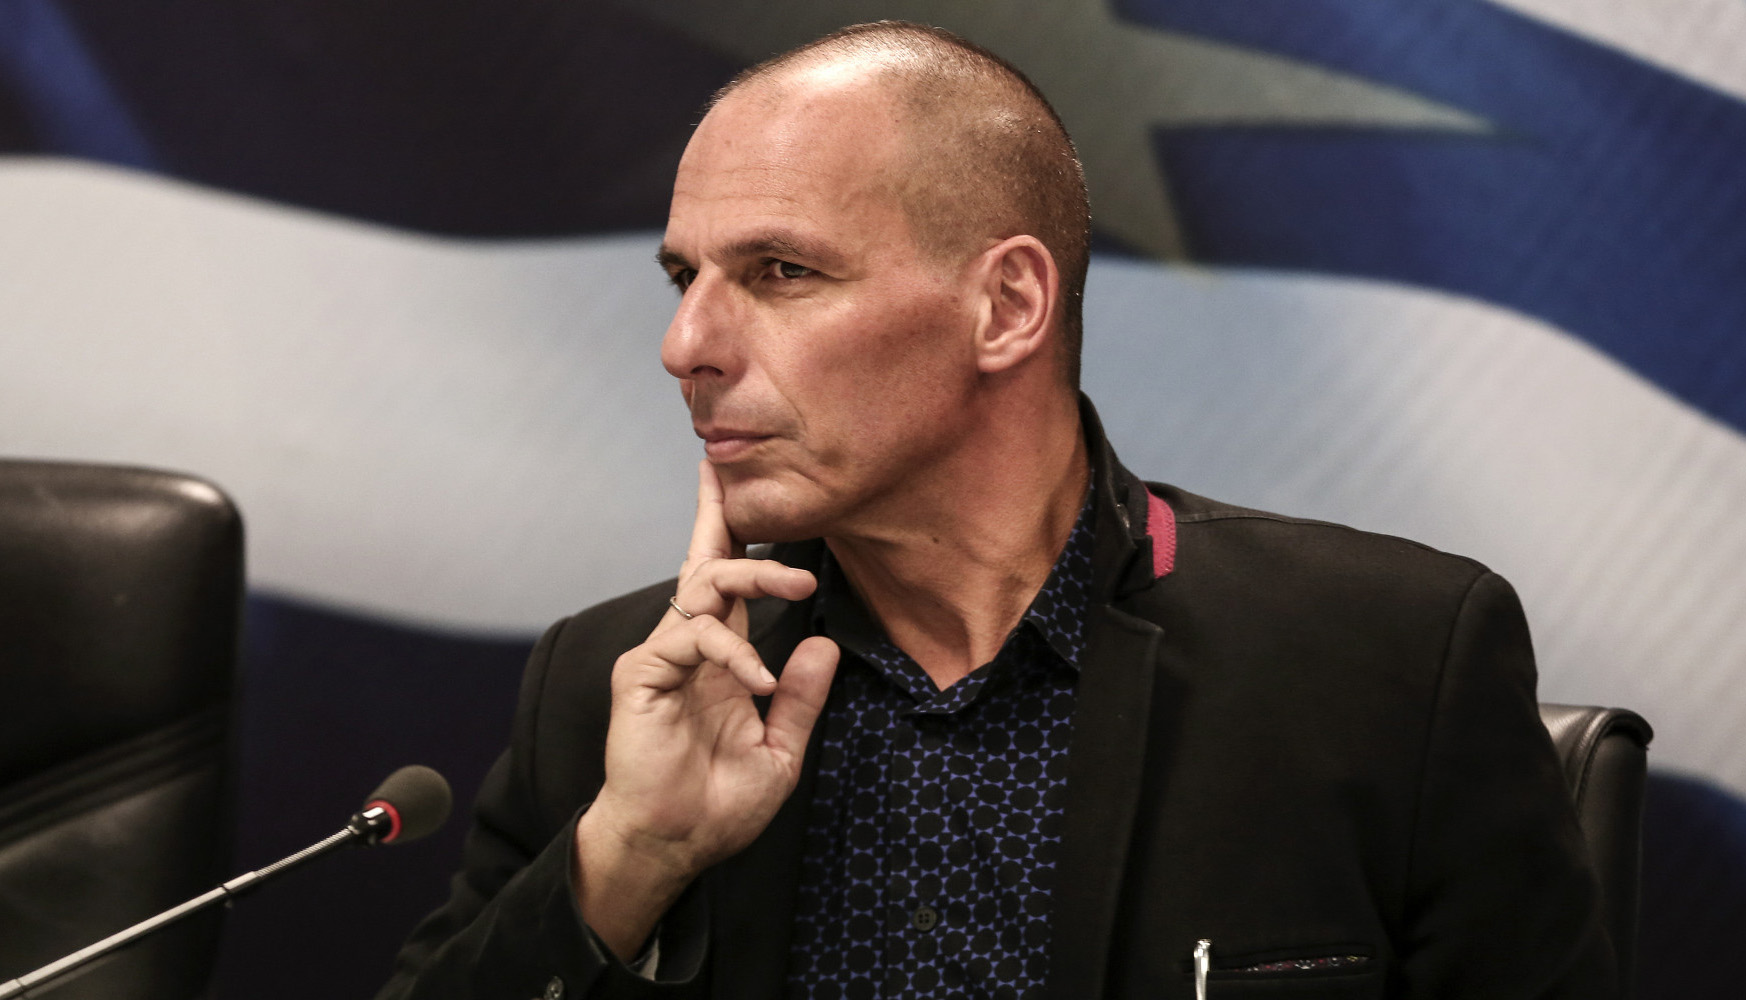 El griego Yanis Varufakis firmó la carta